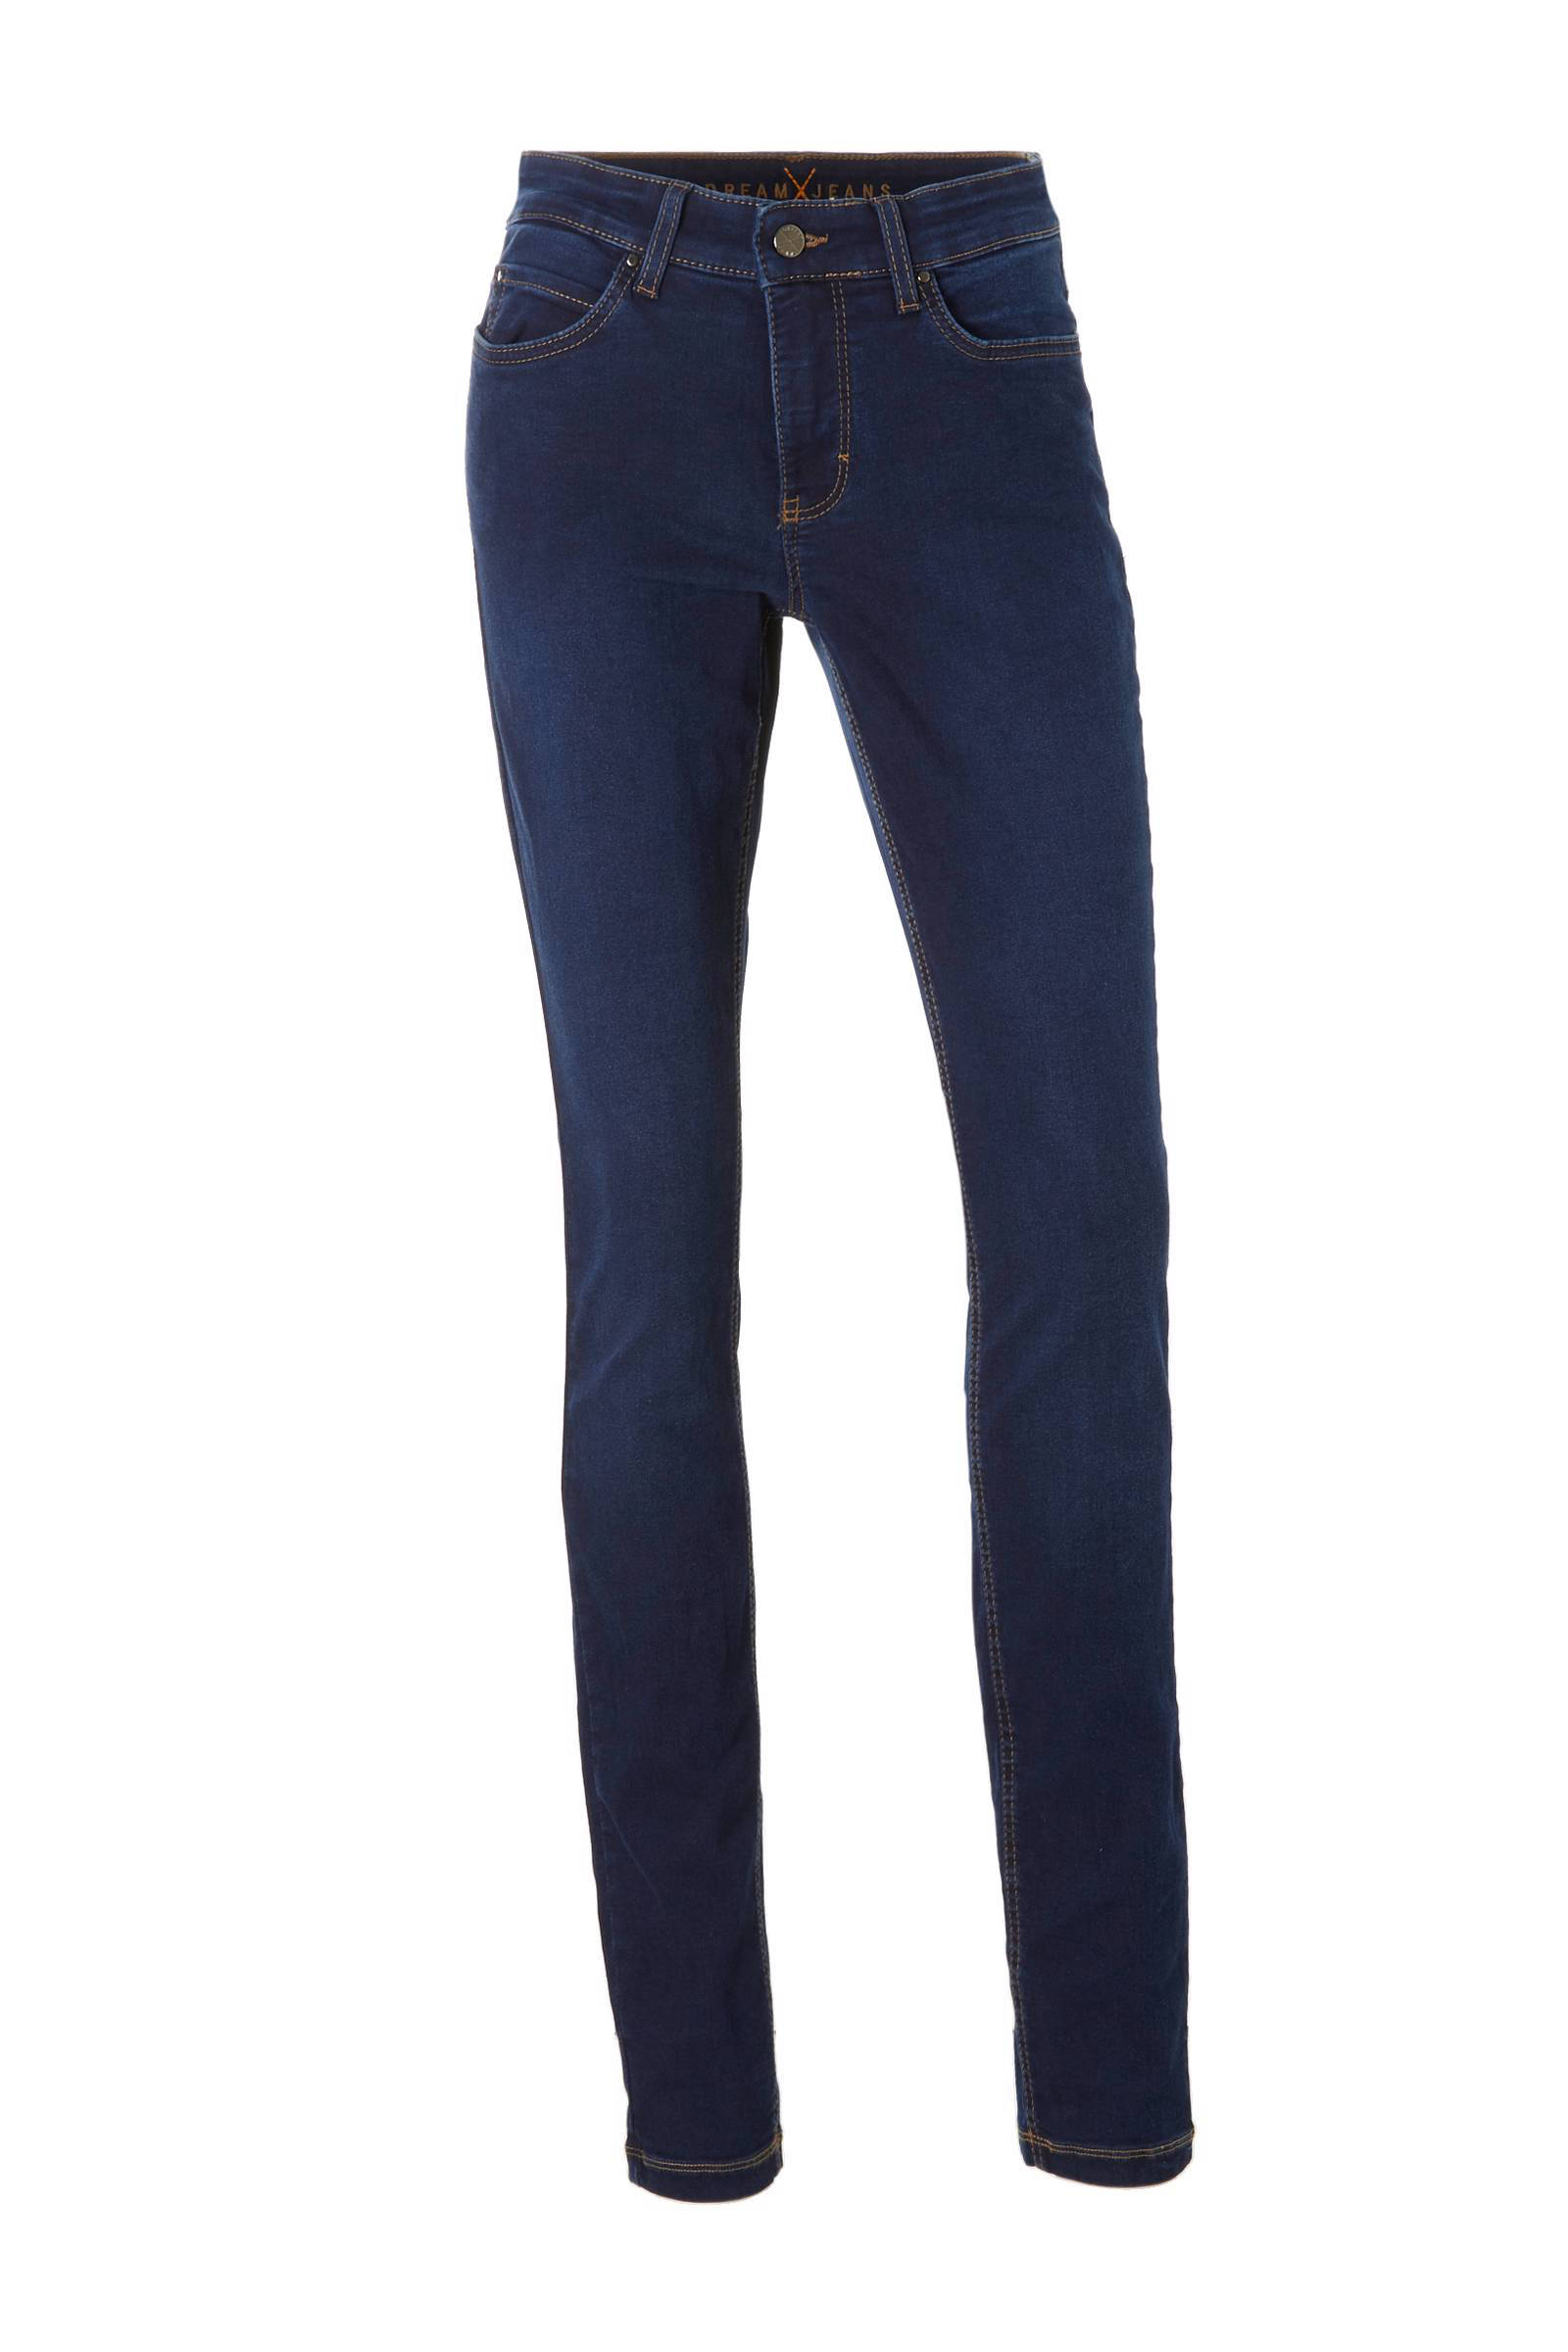 Fit Dream Mac Jeans Wehkamp Skinny 4BwSO7Ewq